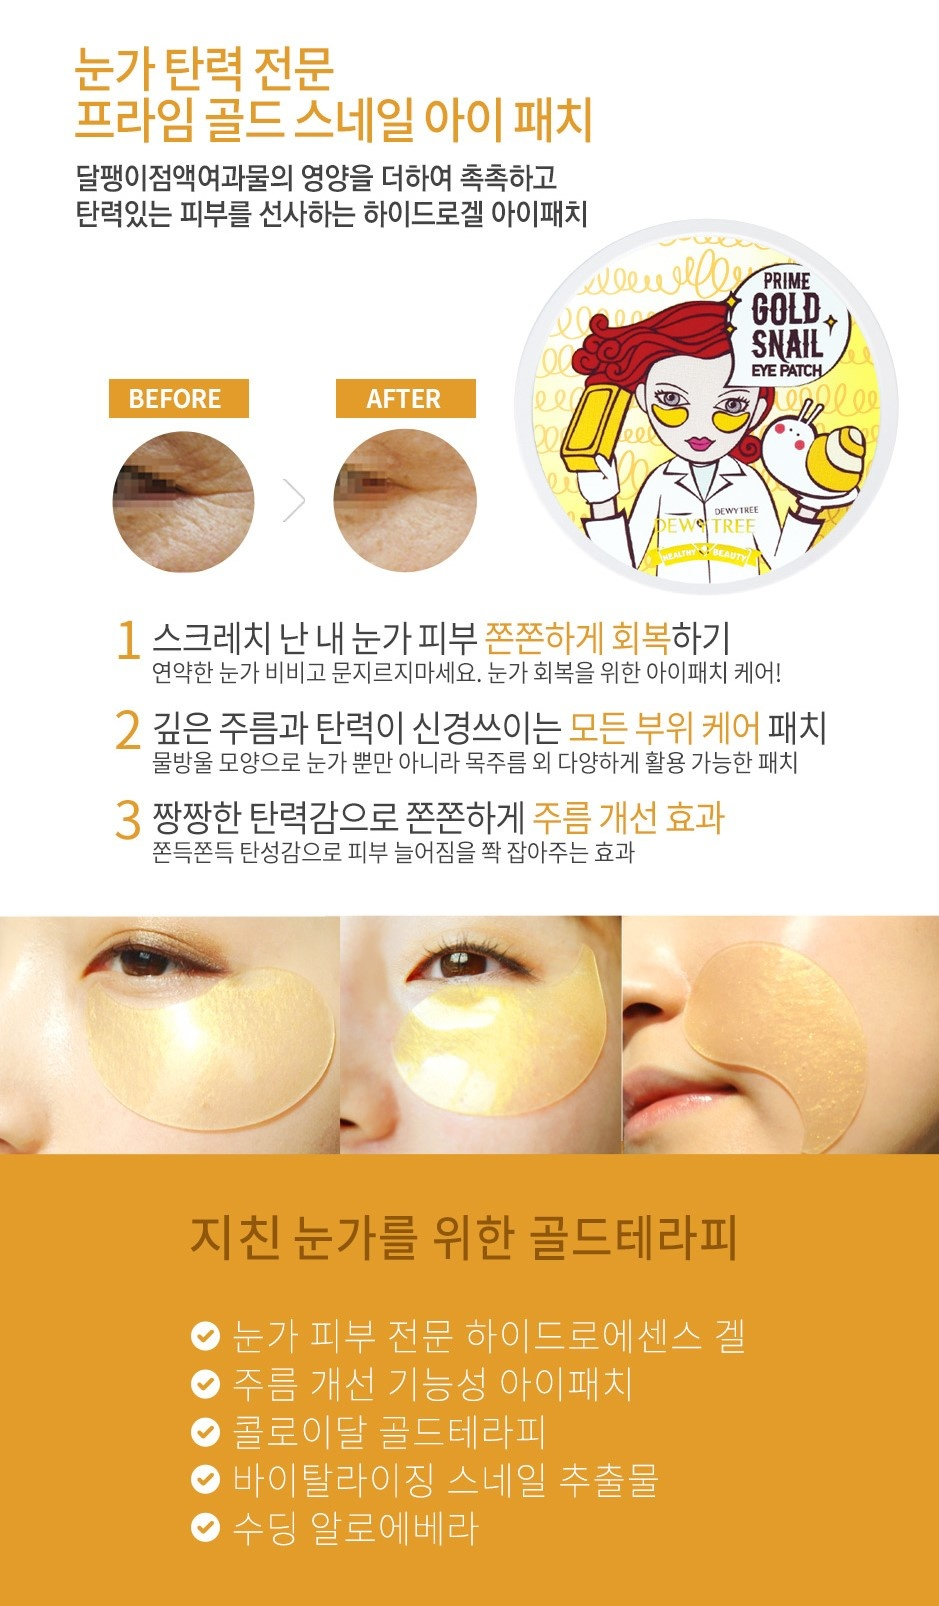 Prime Gold Snail Eye Patch-3